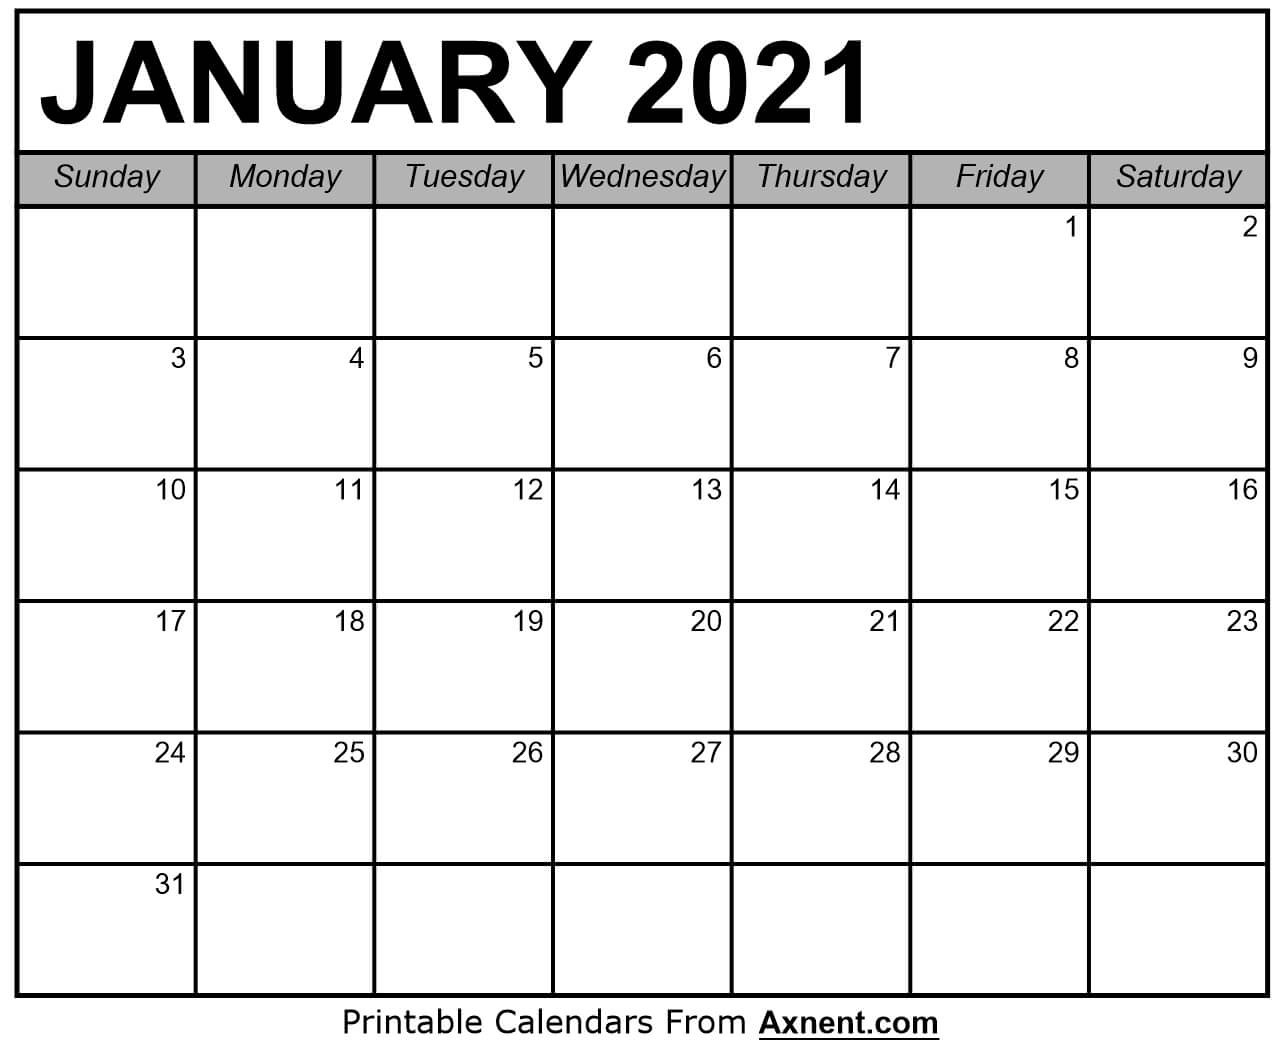 Printable January 2021 Calendar Template - Time Management  Word January 2021 Template